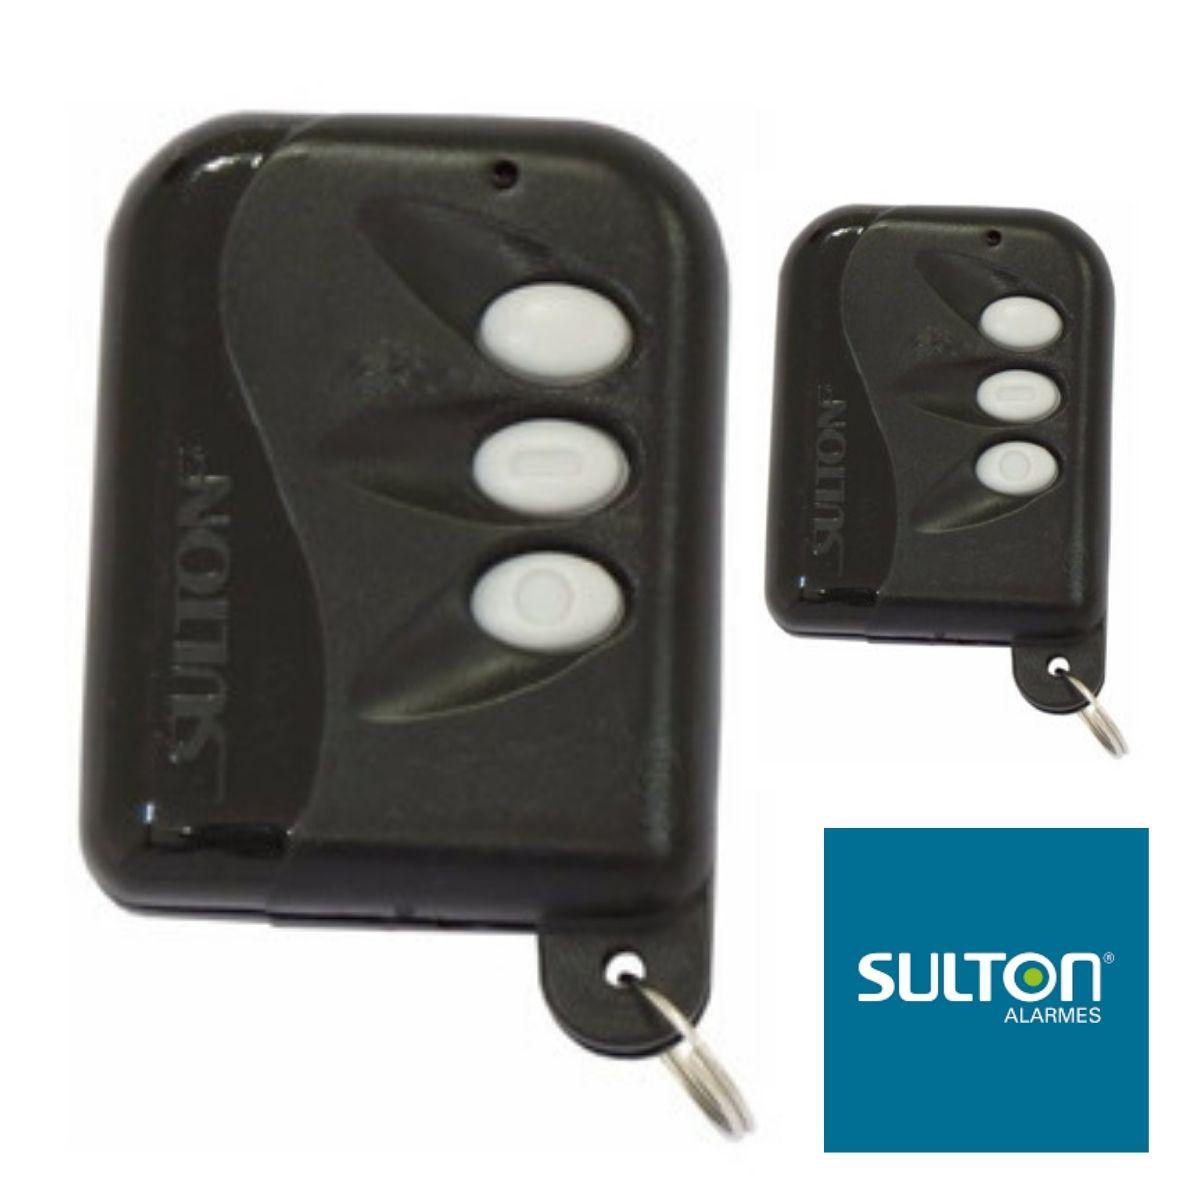 CONTROLE TCL SULTON  20 unidades